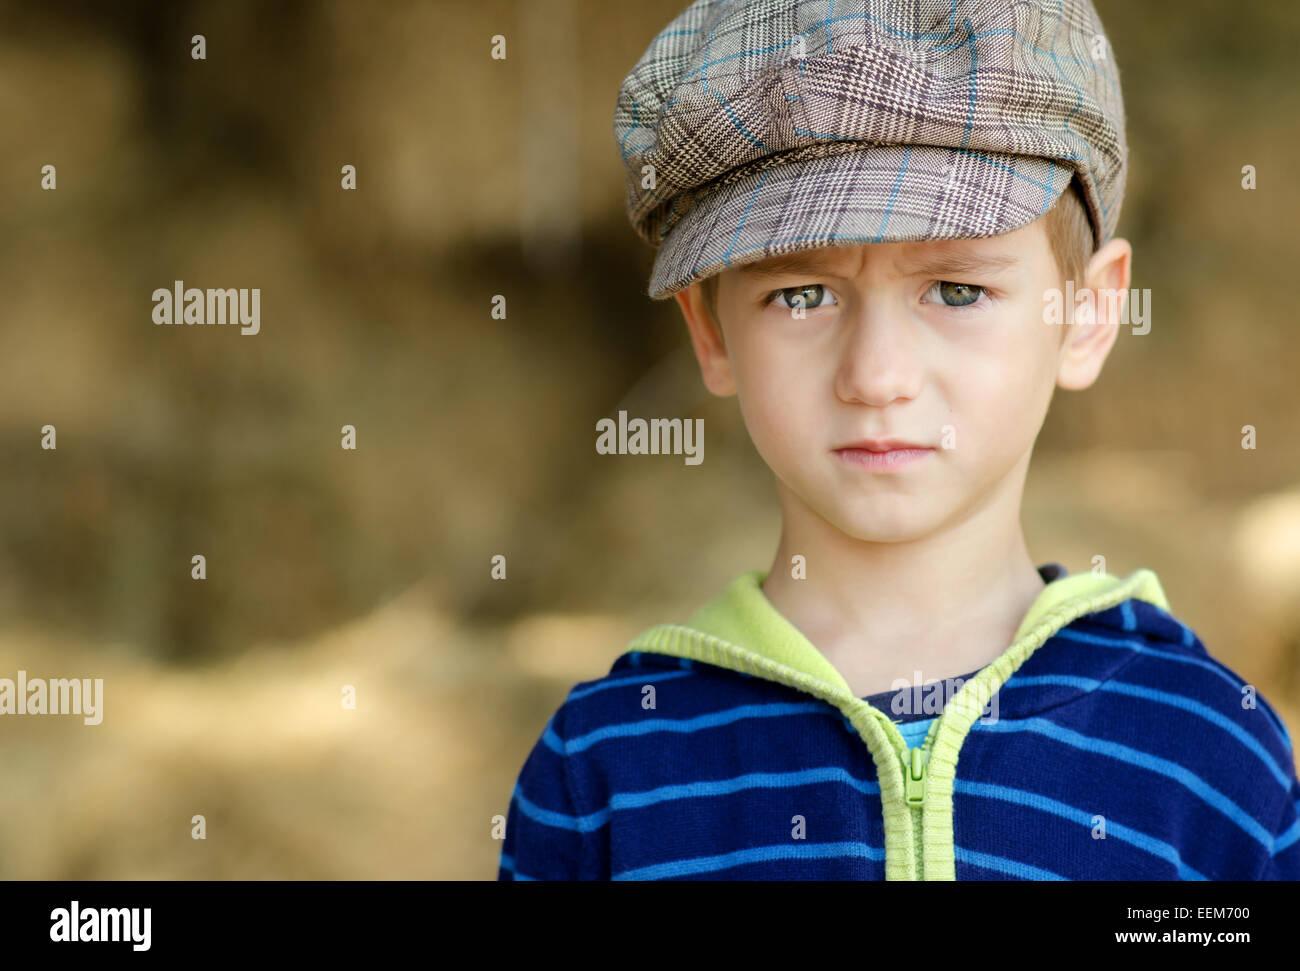 Bulgarien, Porträt von Ernst Knabe (4-5) Stockbild